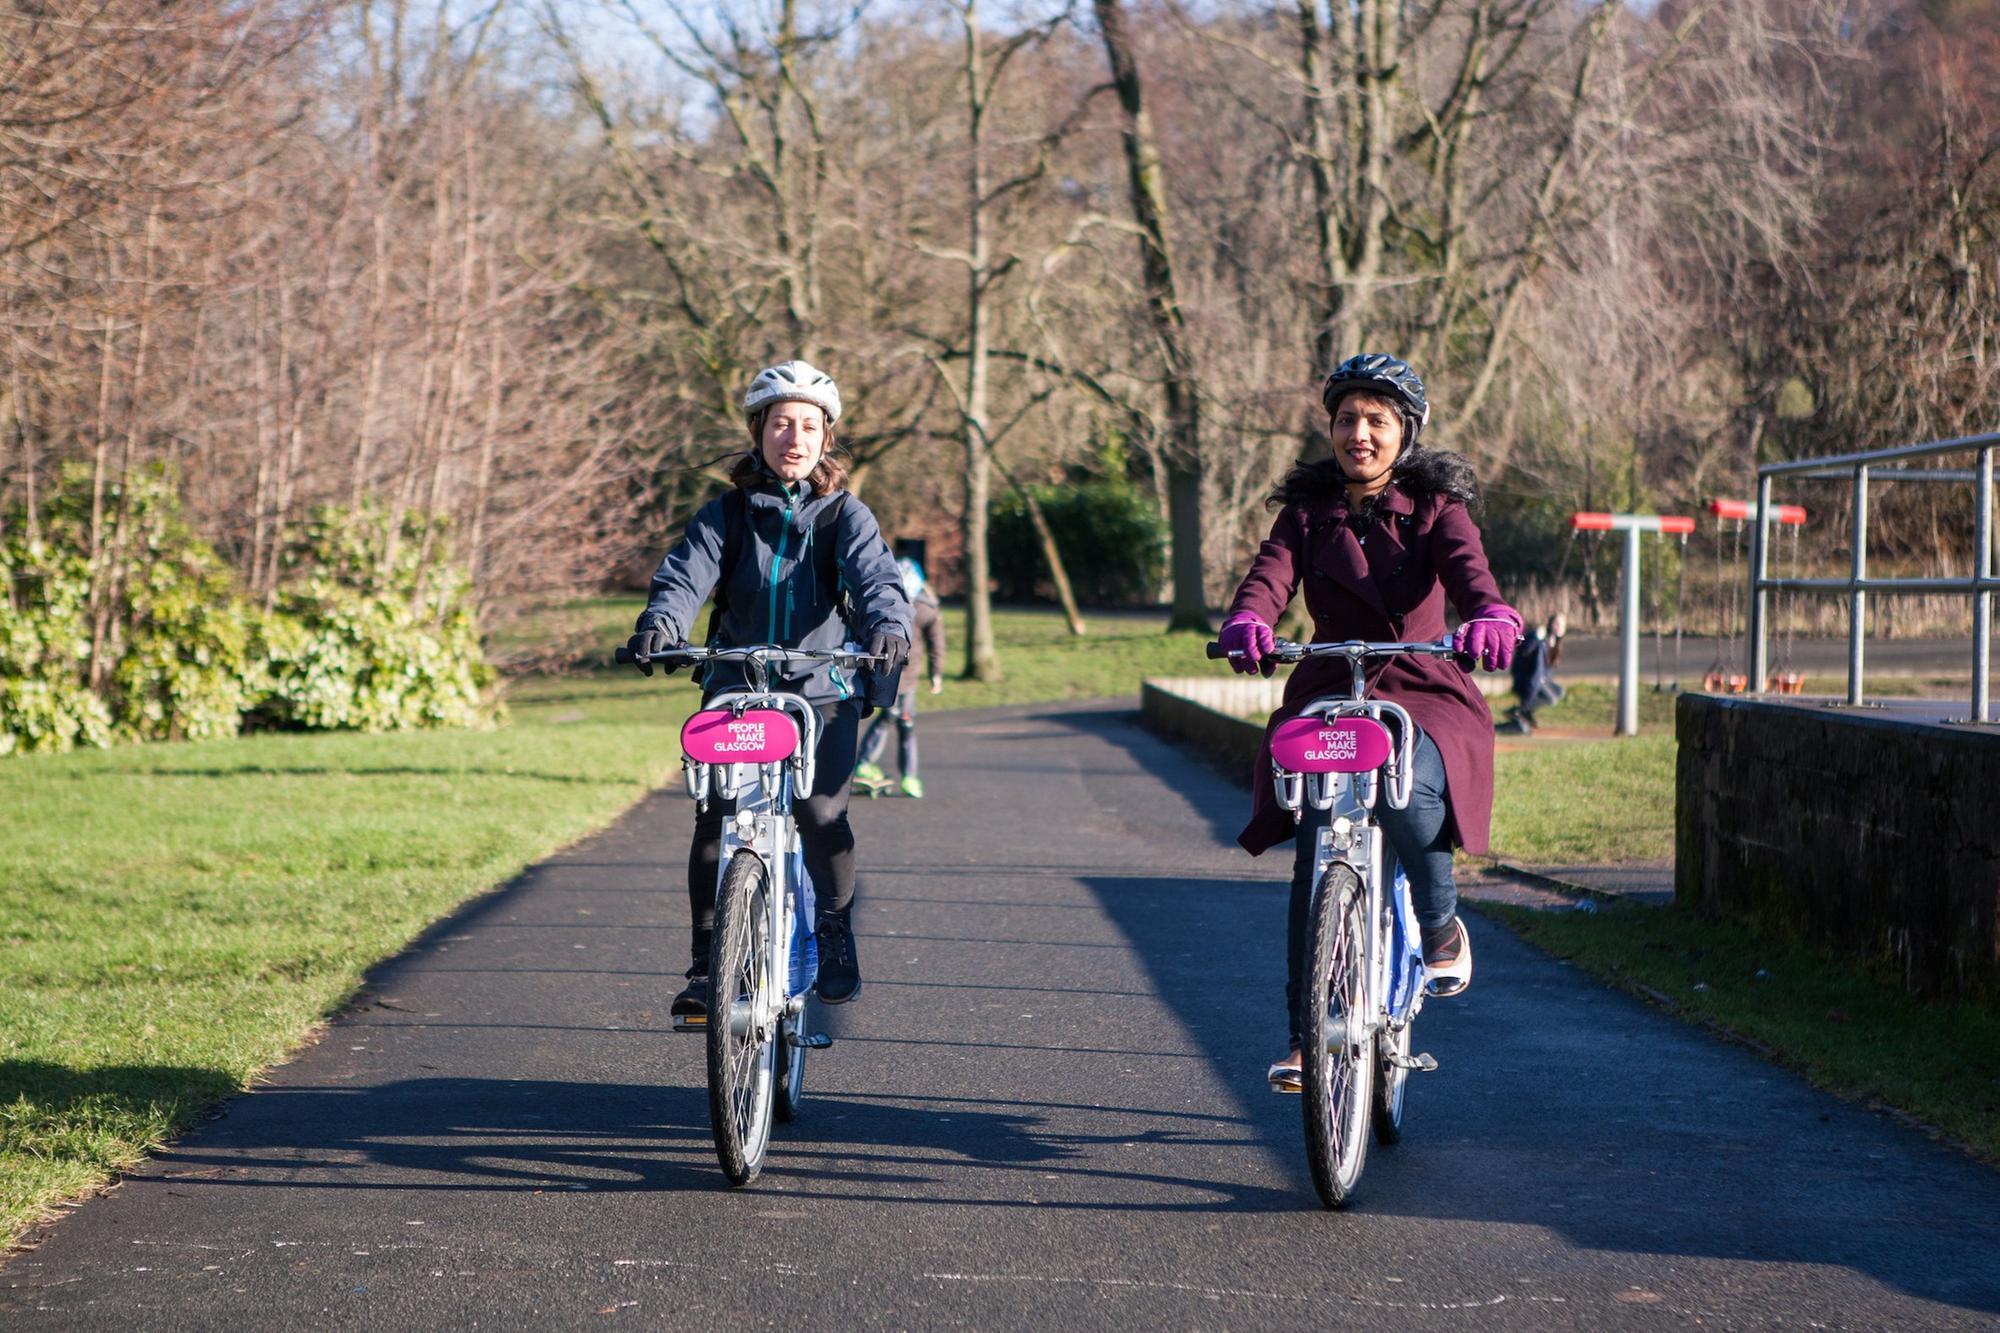 Glasgow bike hire scheme hits new monthly rentals record